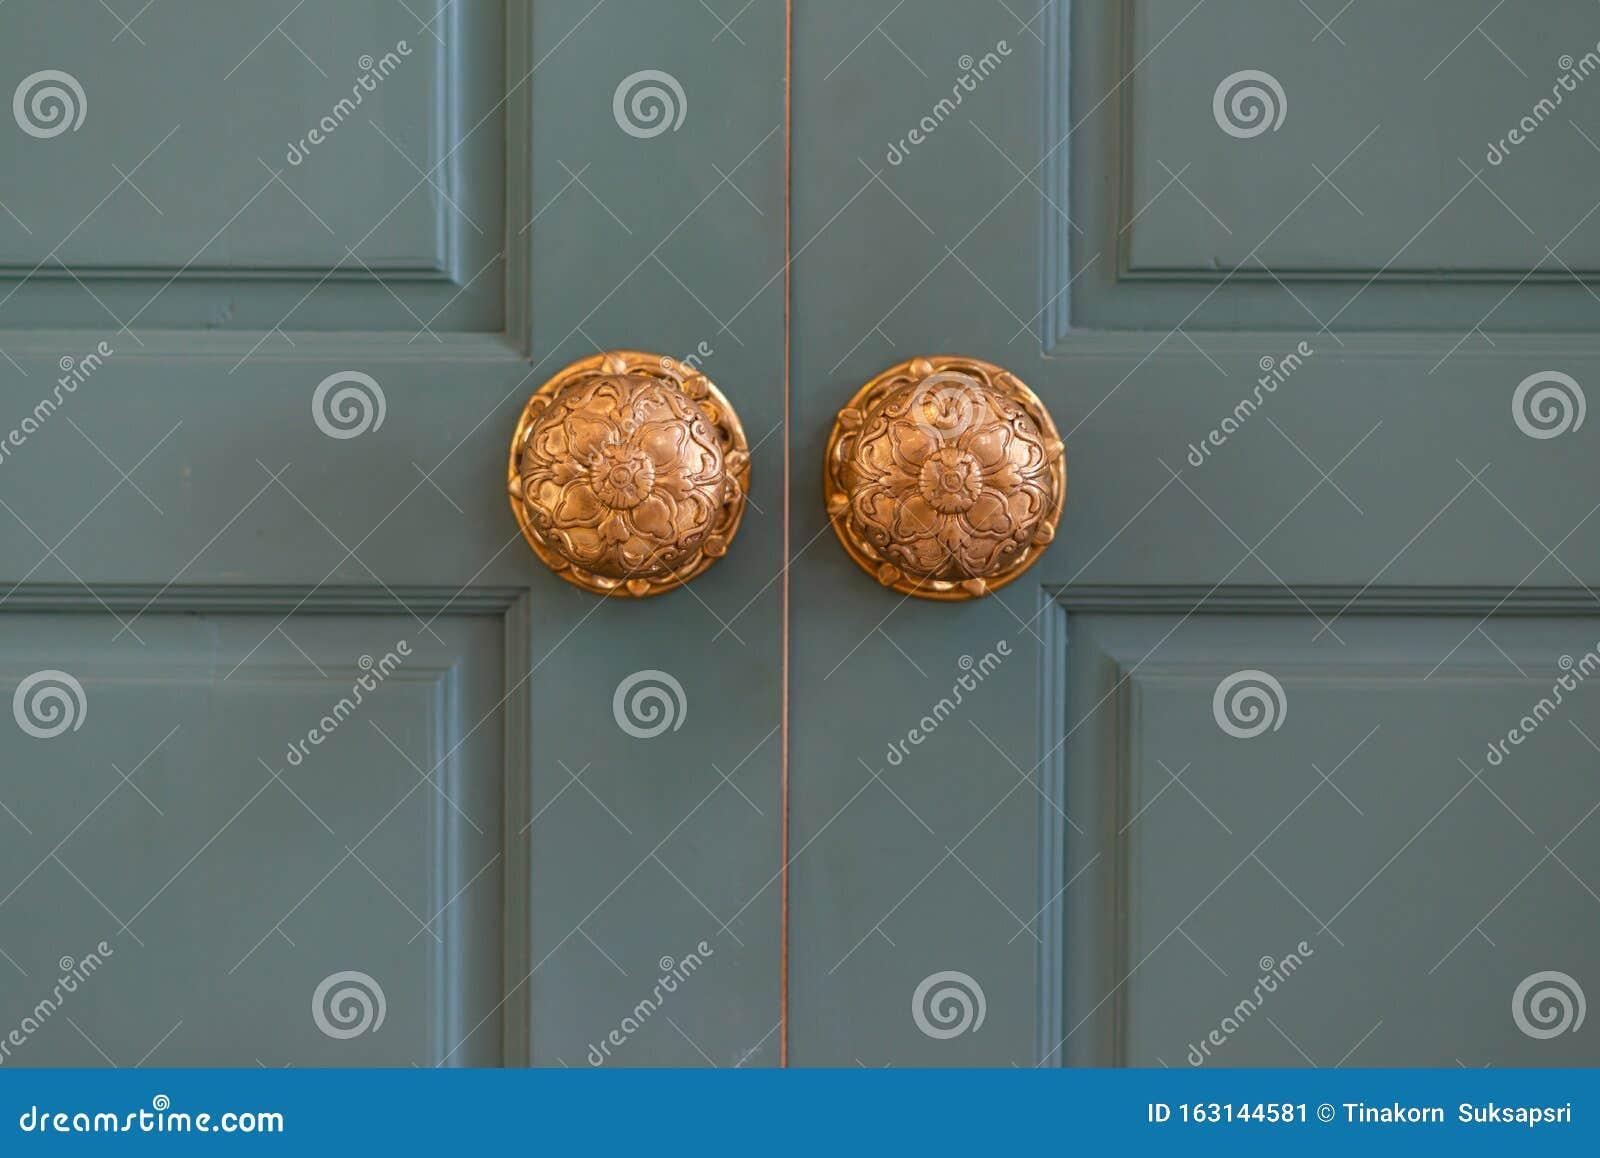 Classic Retro Brass Door Knob Vintage Decoration Retro Interior Stock Image Image Of Building Frame 163144581